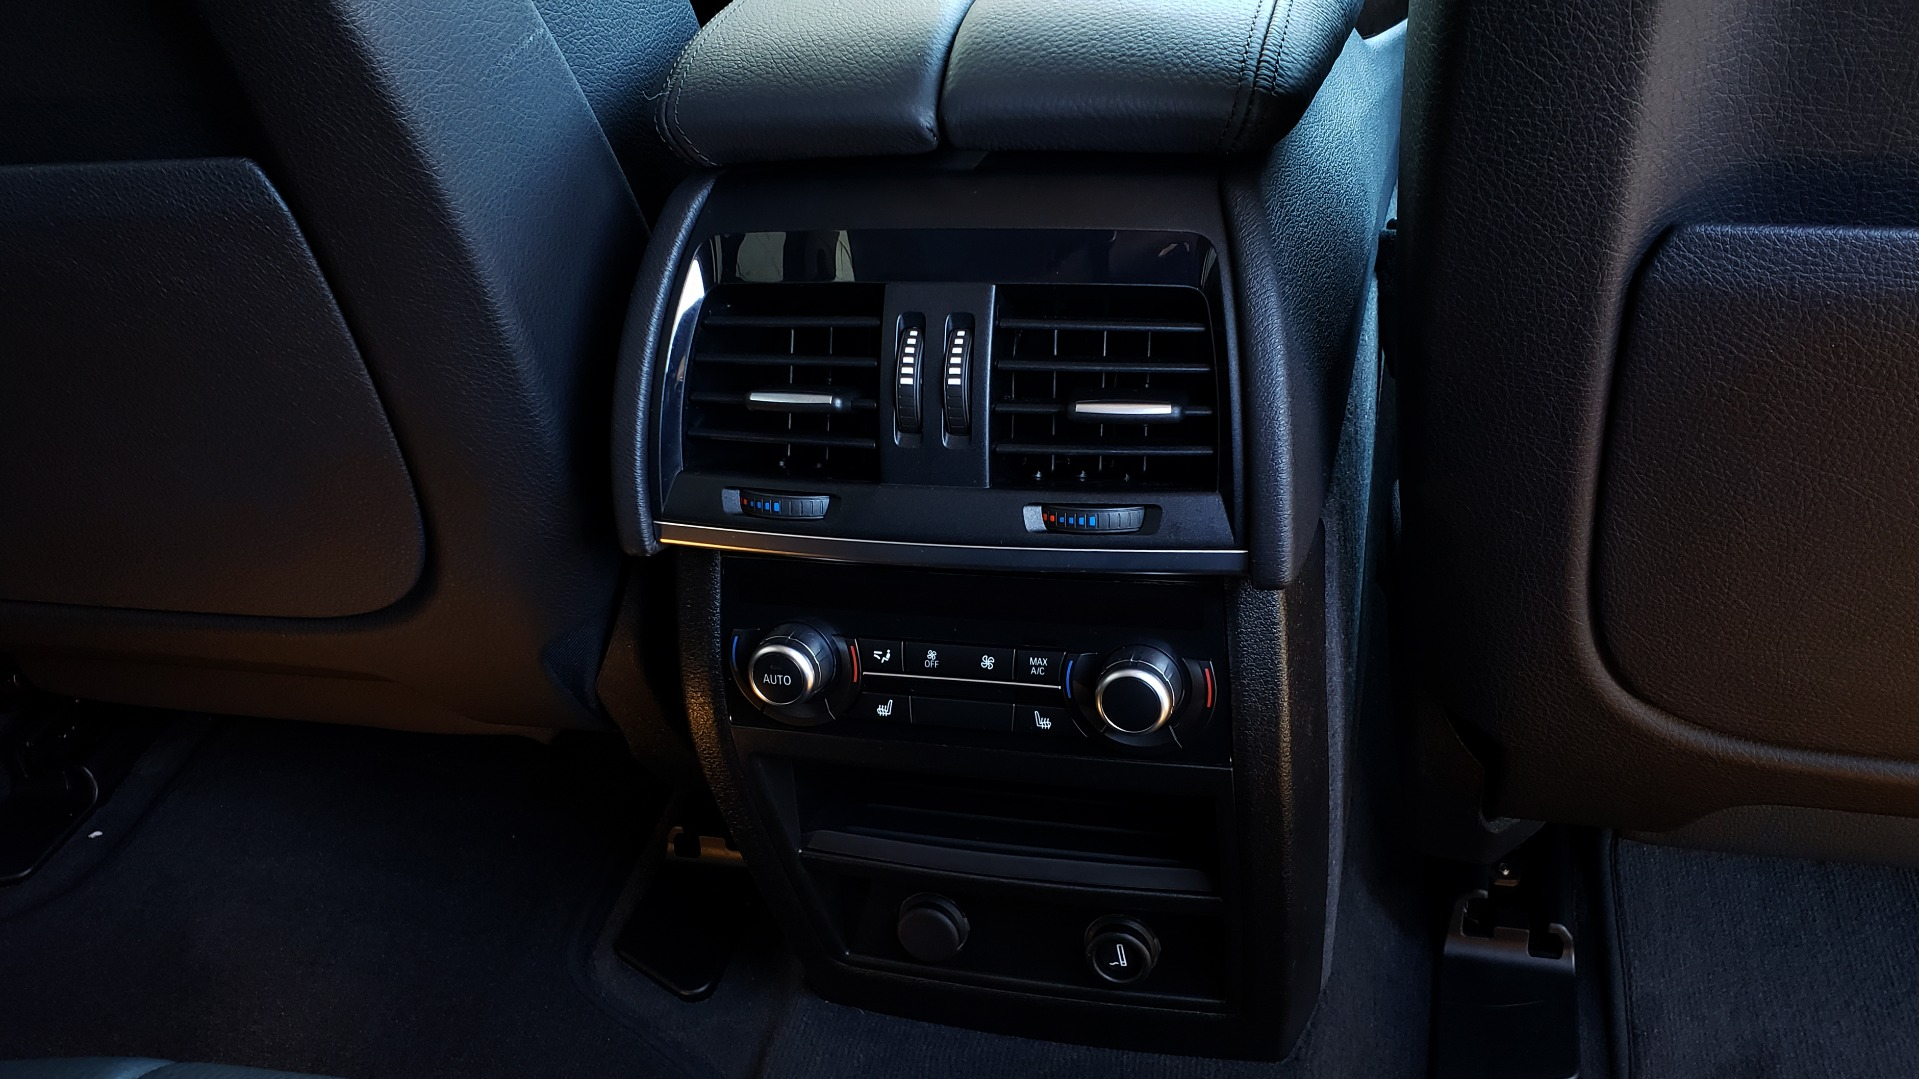 Used 2016 BMW X5 XDRIVE35I / PREM PKG / NAV / DRVR ASST PLUS / REARVIEW for sale $25,765 at Formula Imports in Charlotte NC 28227 53